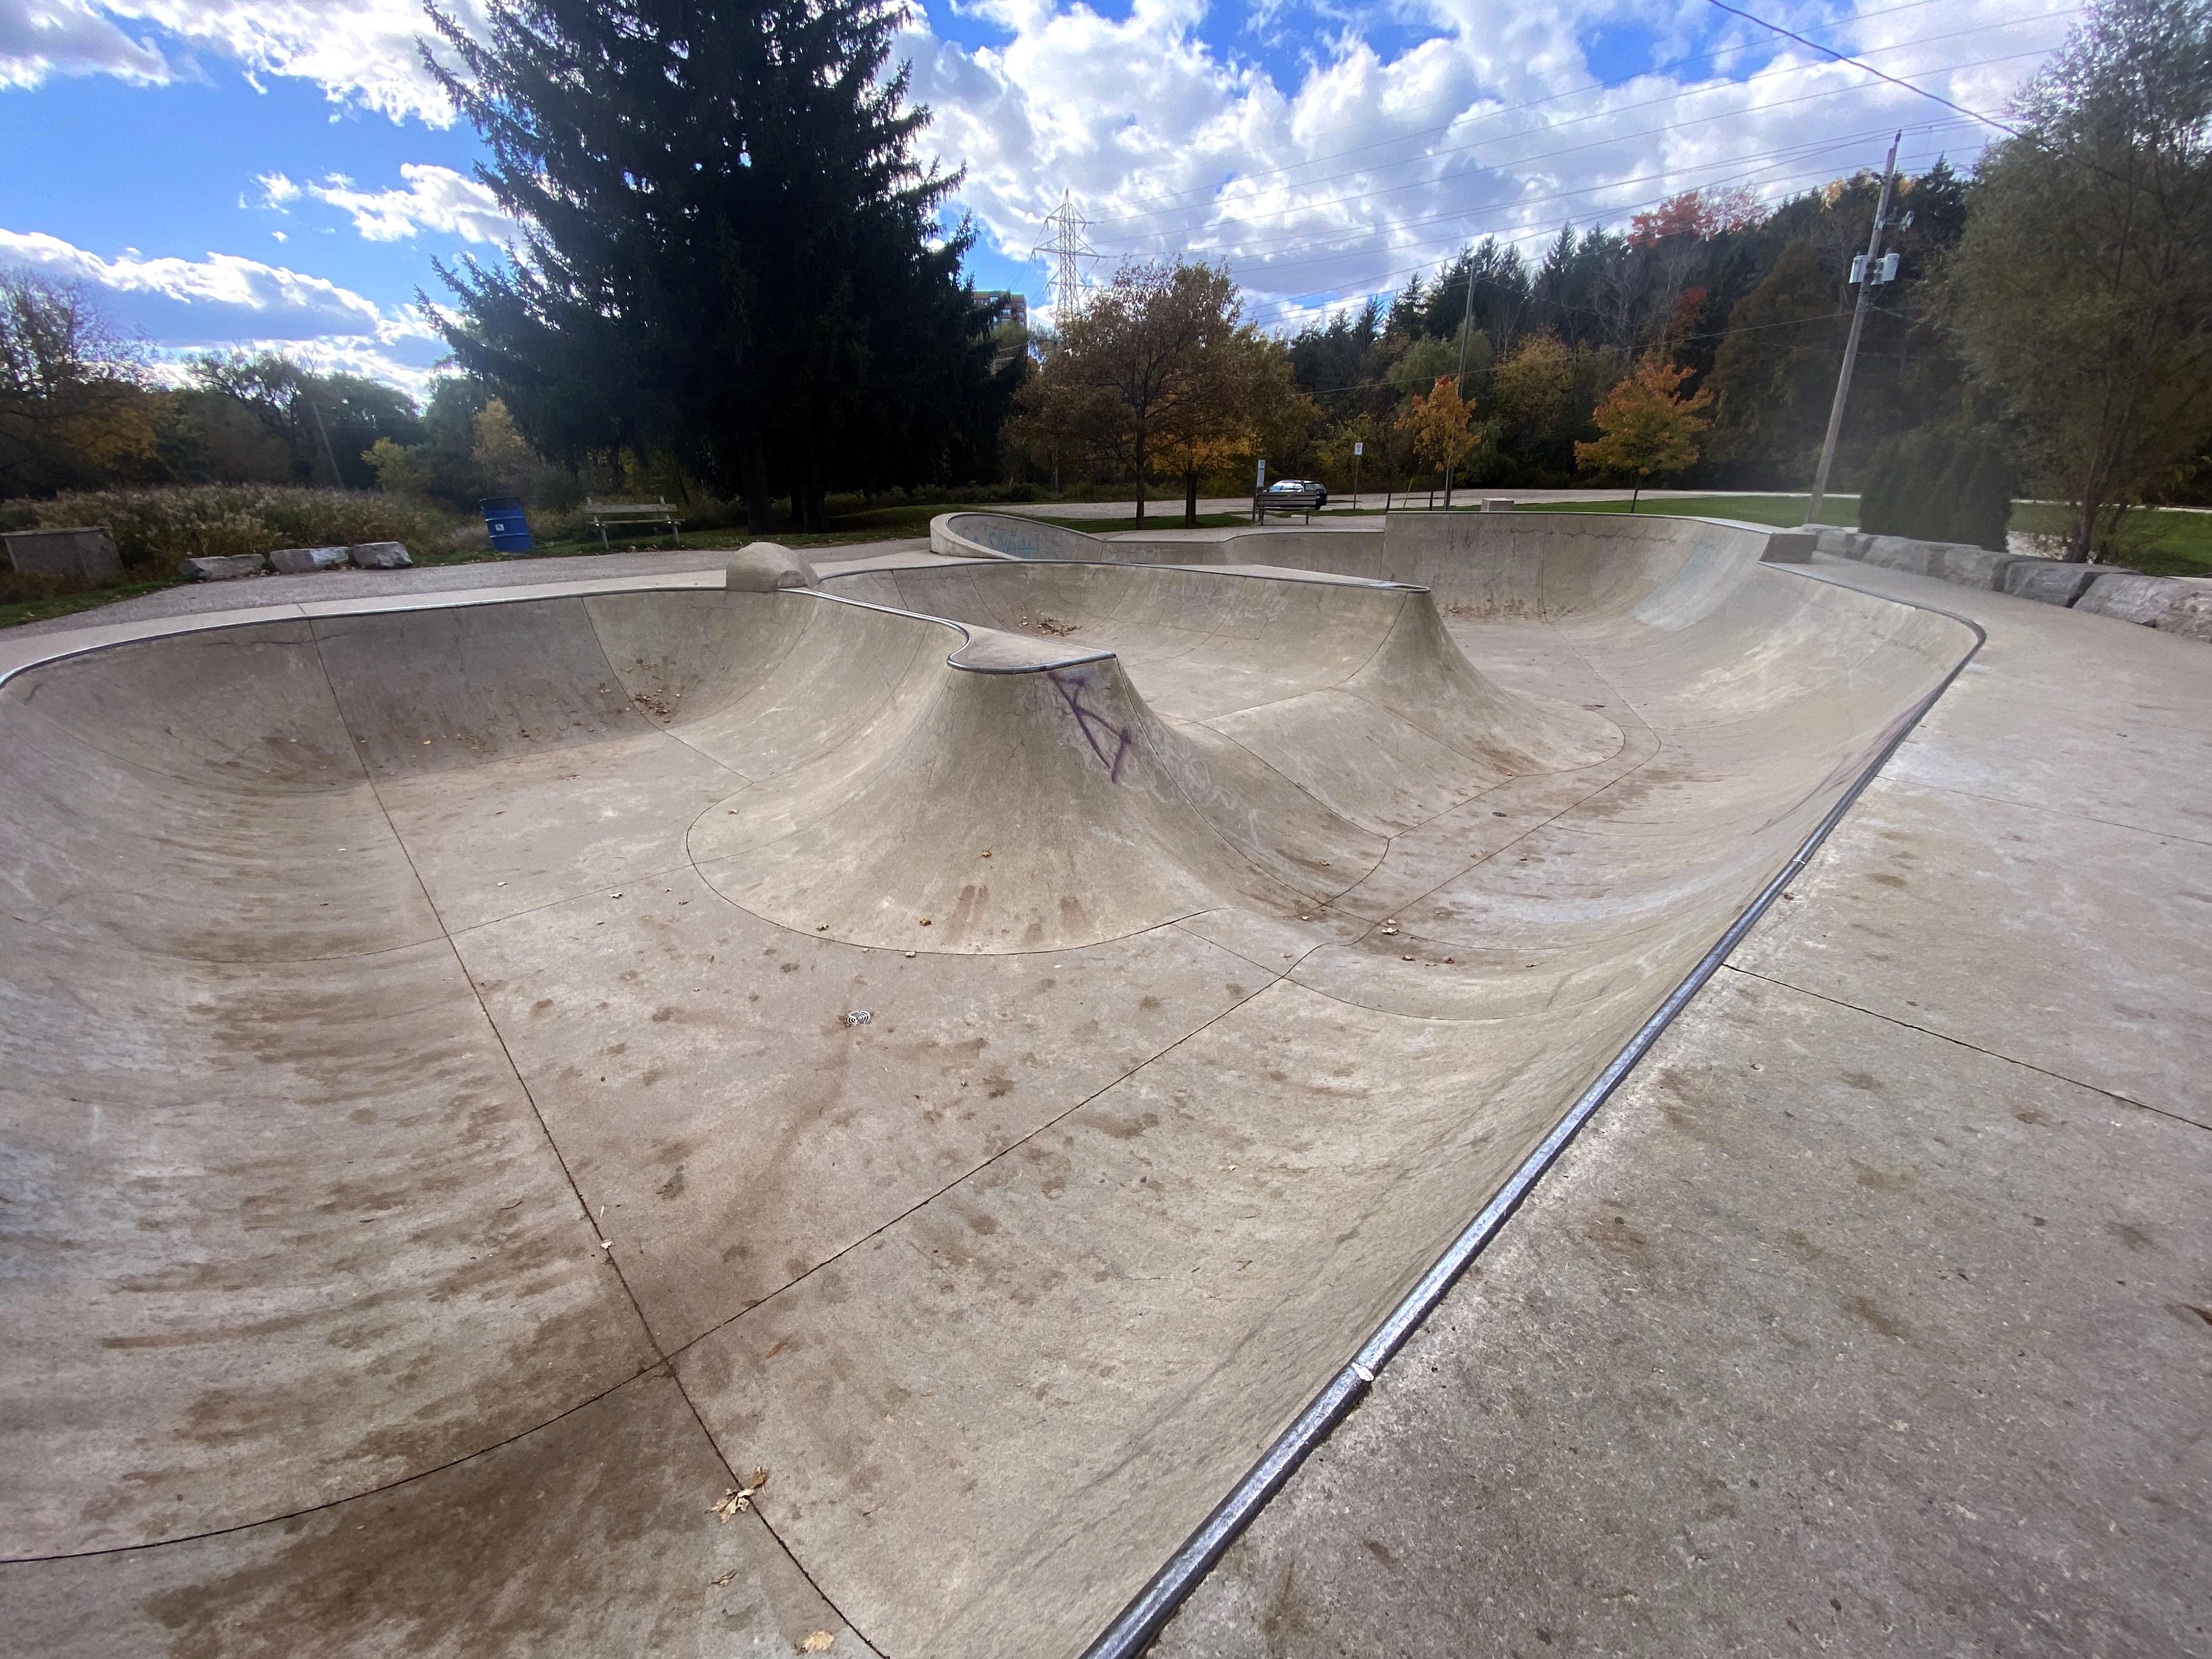 cambridge skatepark